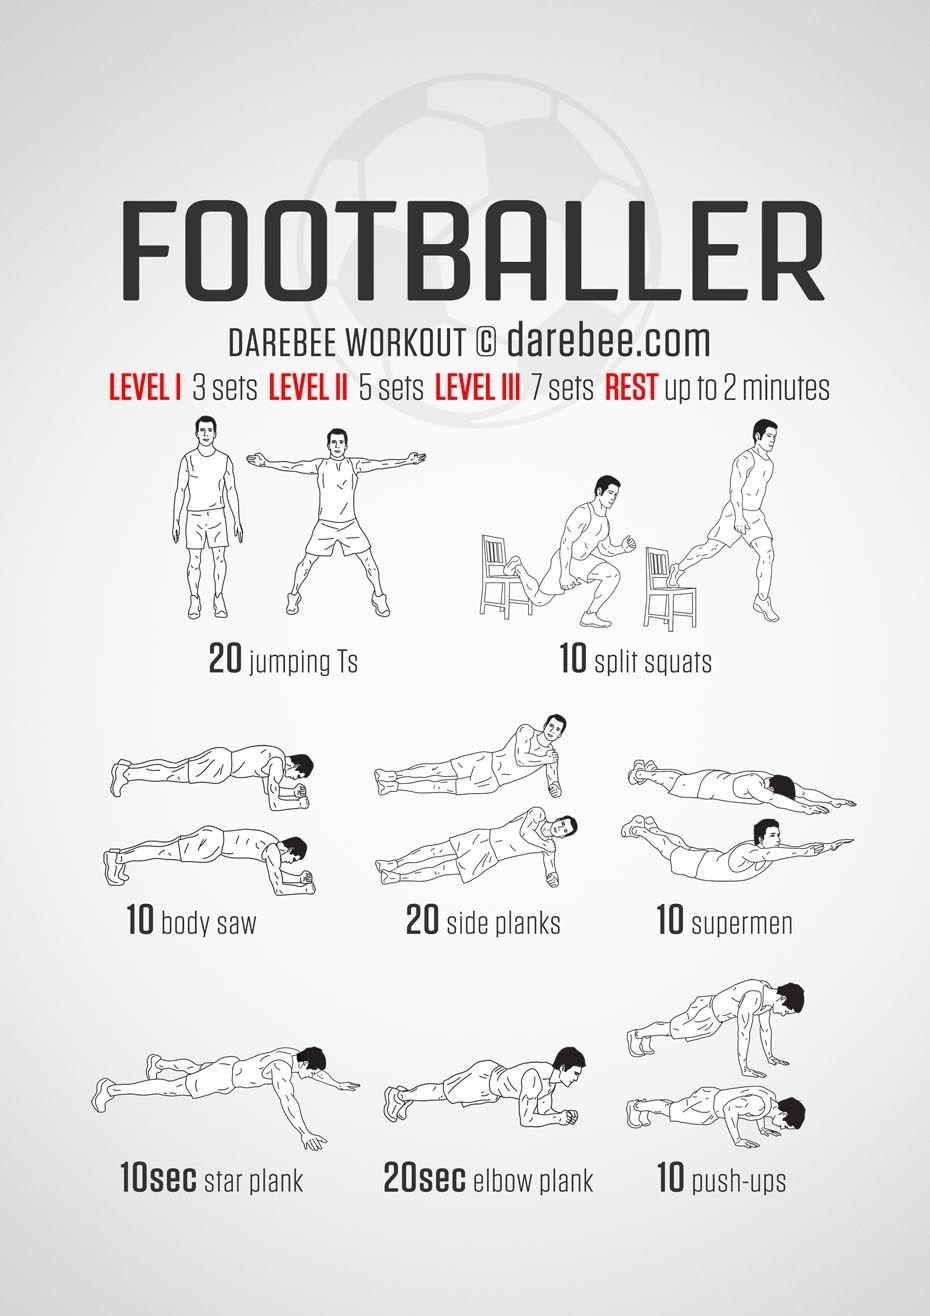 Footballer Workout Football Workouts Soccer Workouts Superhero Workout